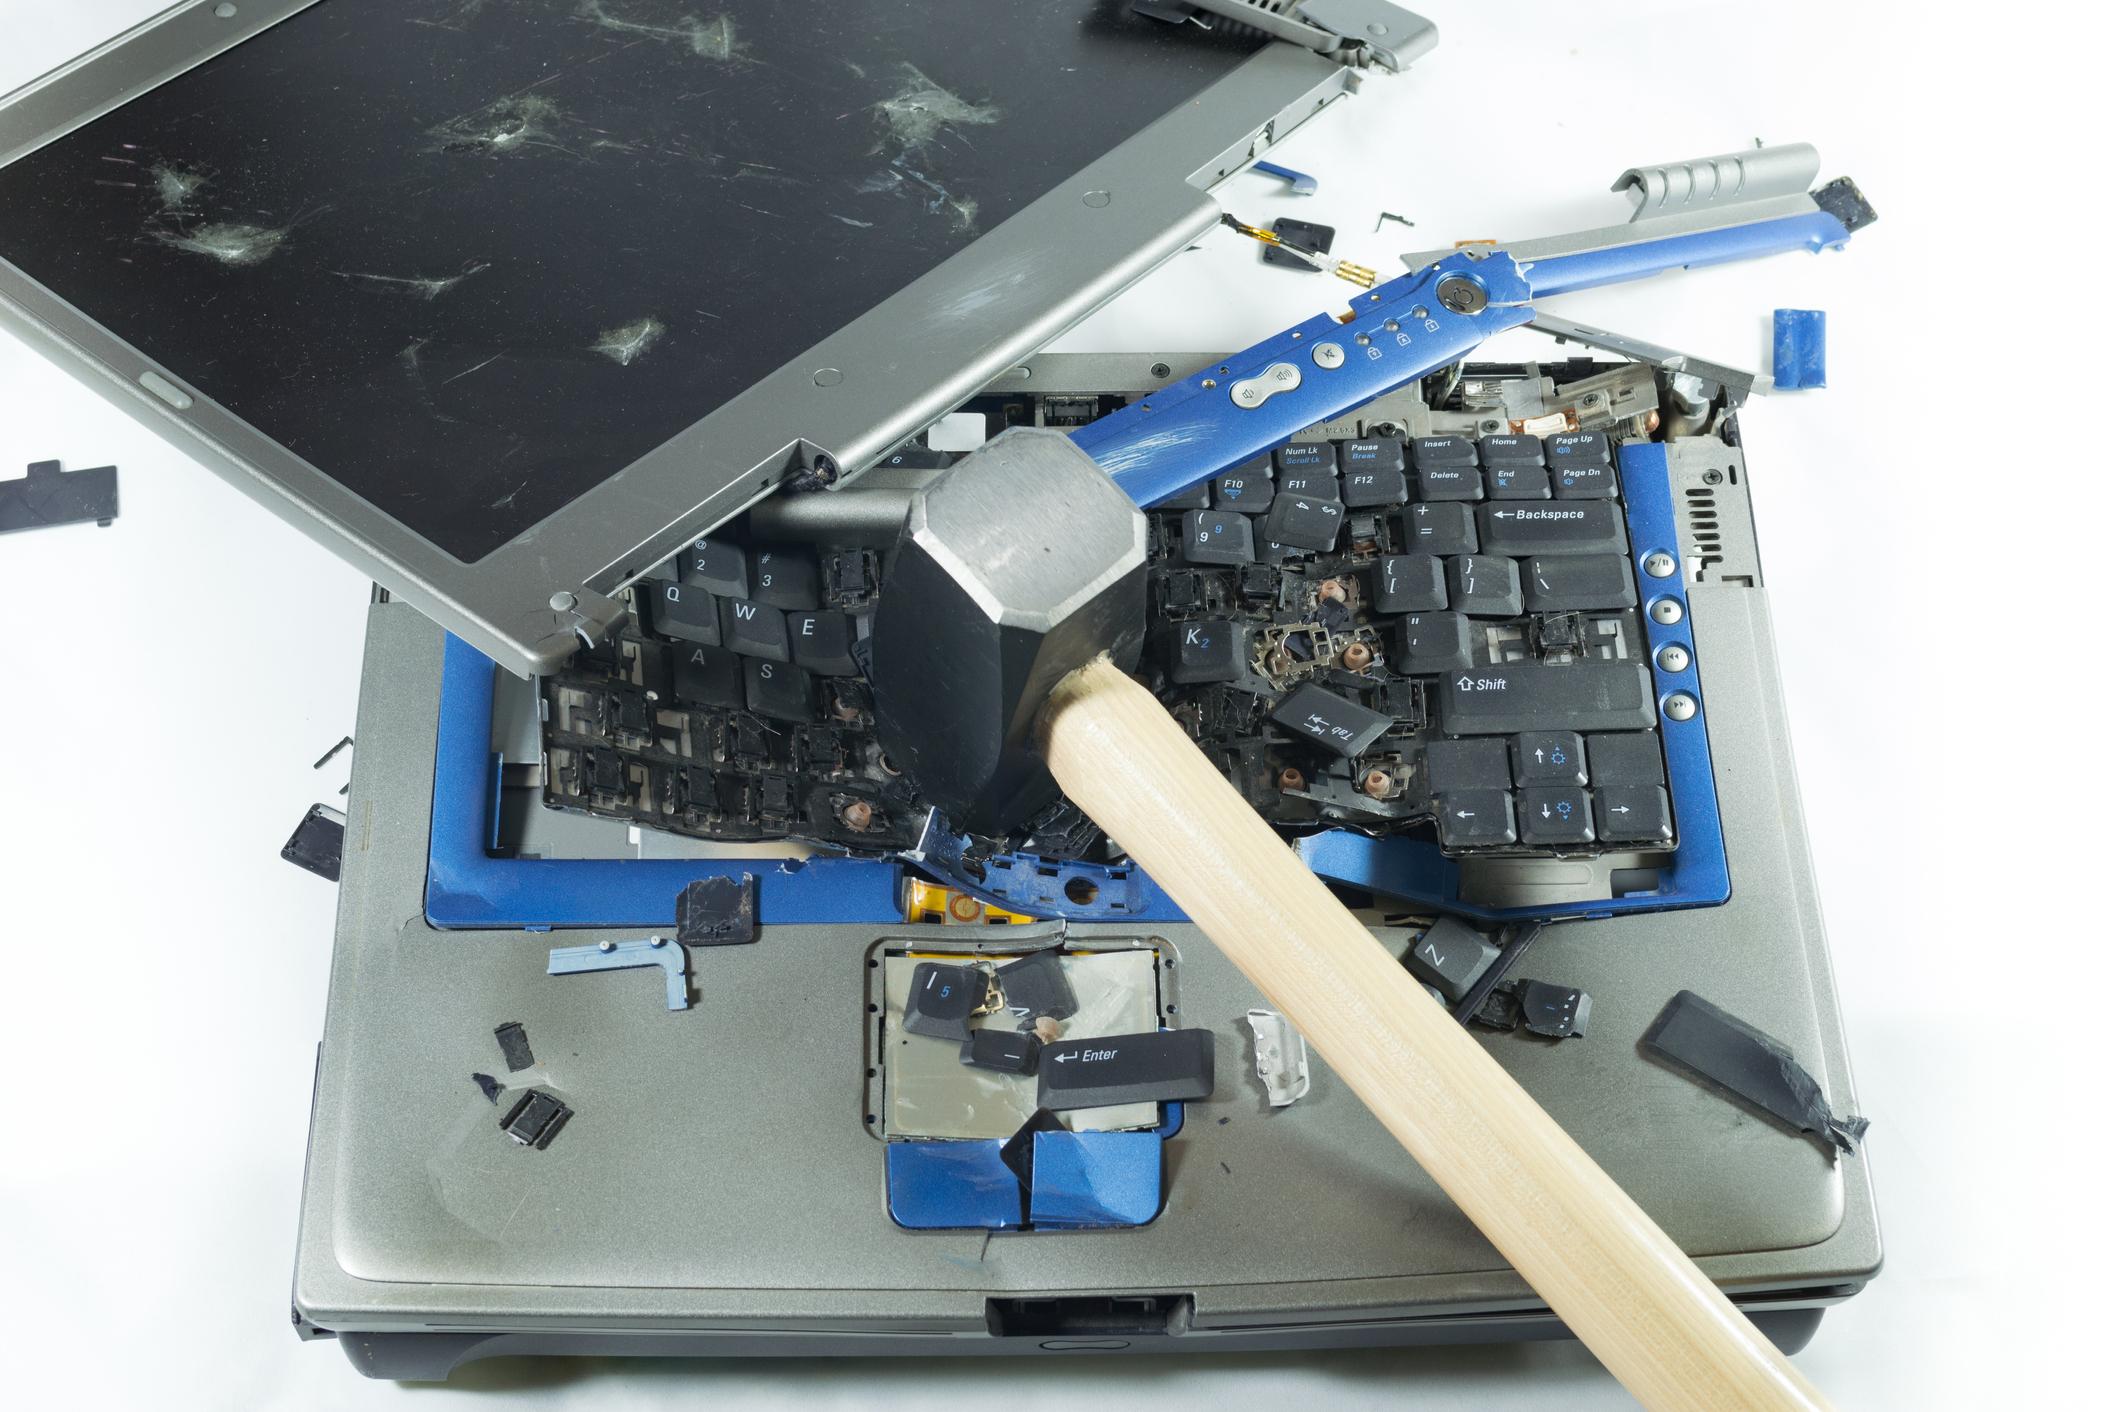 Sledgehammer breaking a computer